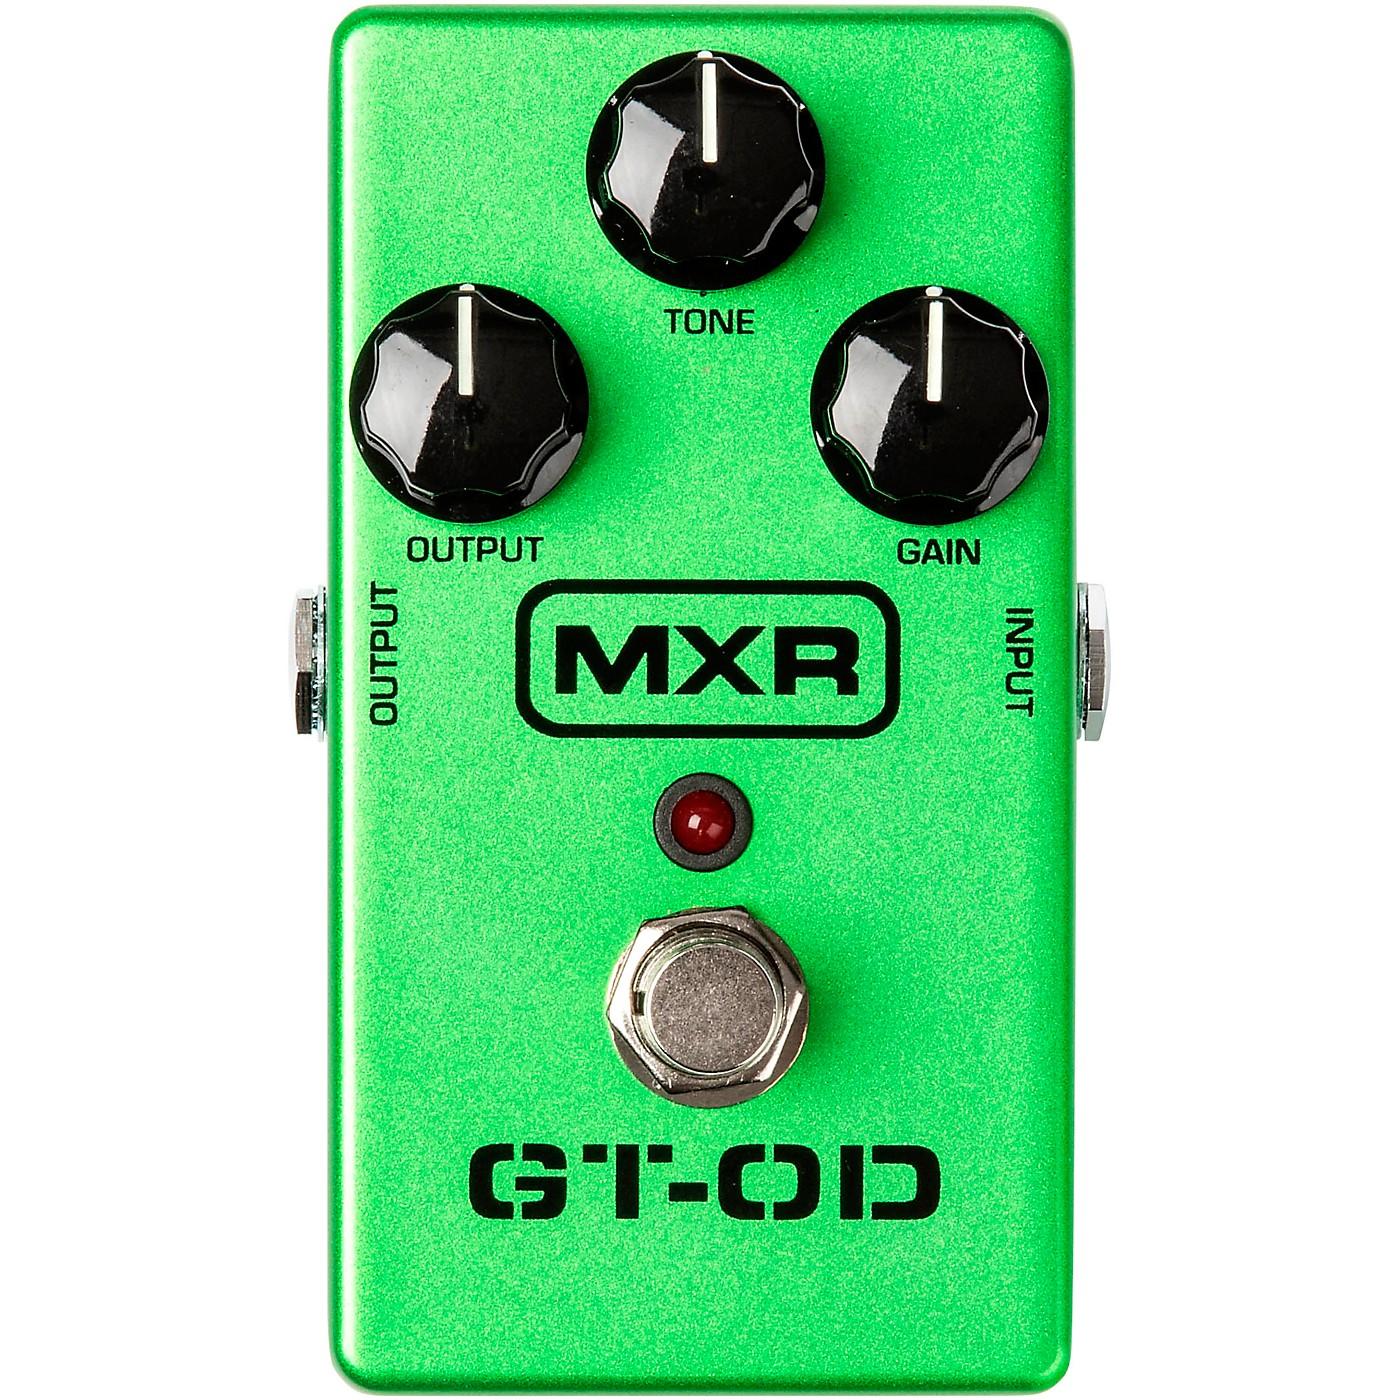 MXR M193 GT-OD Overdrive Effects Pedal thumbnail